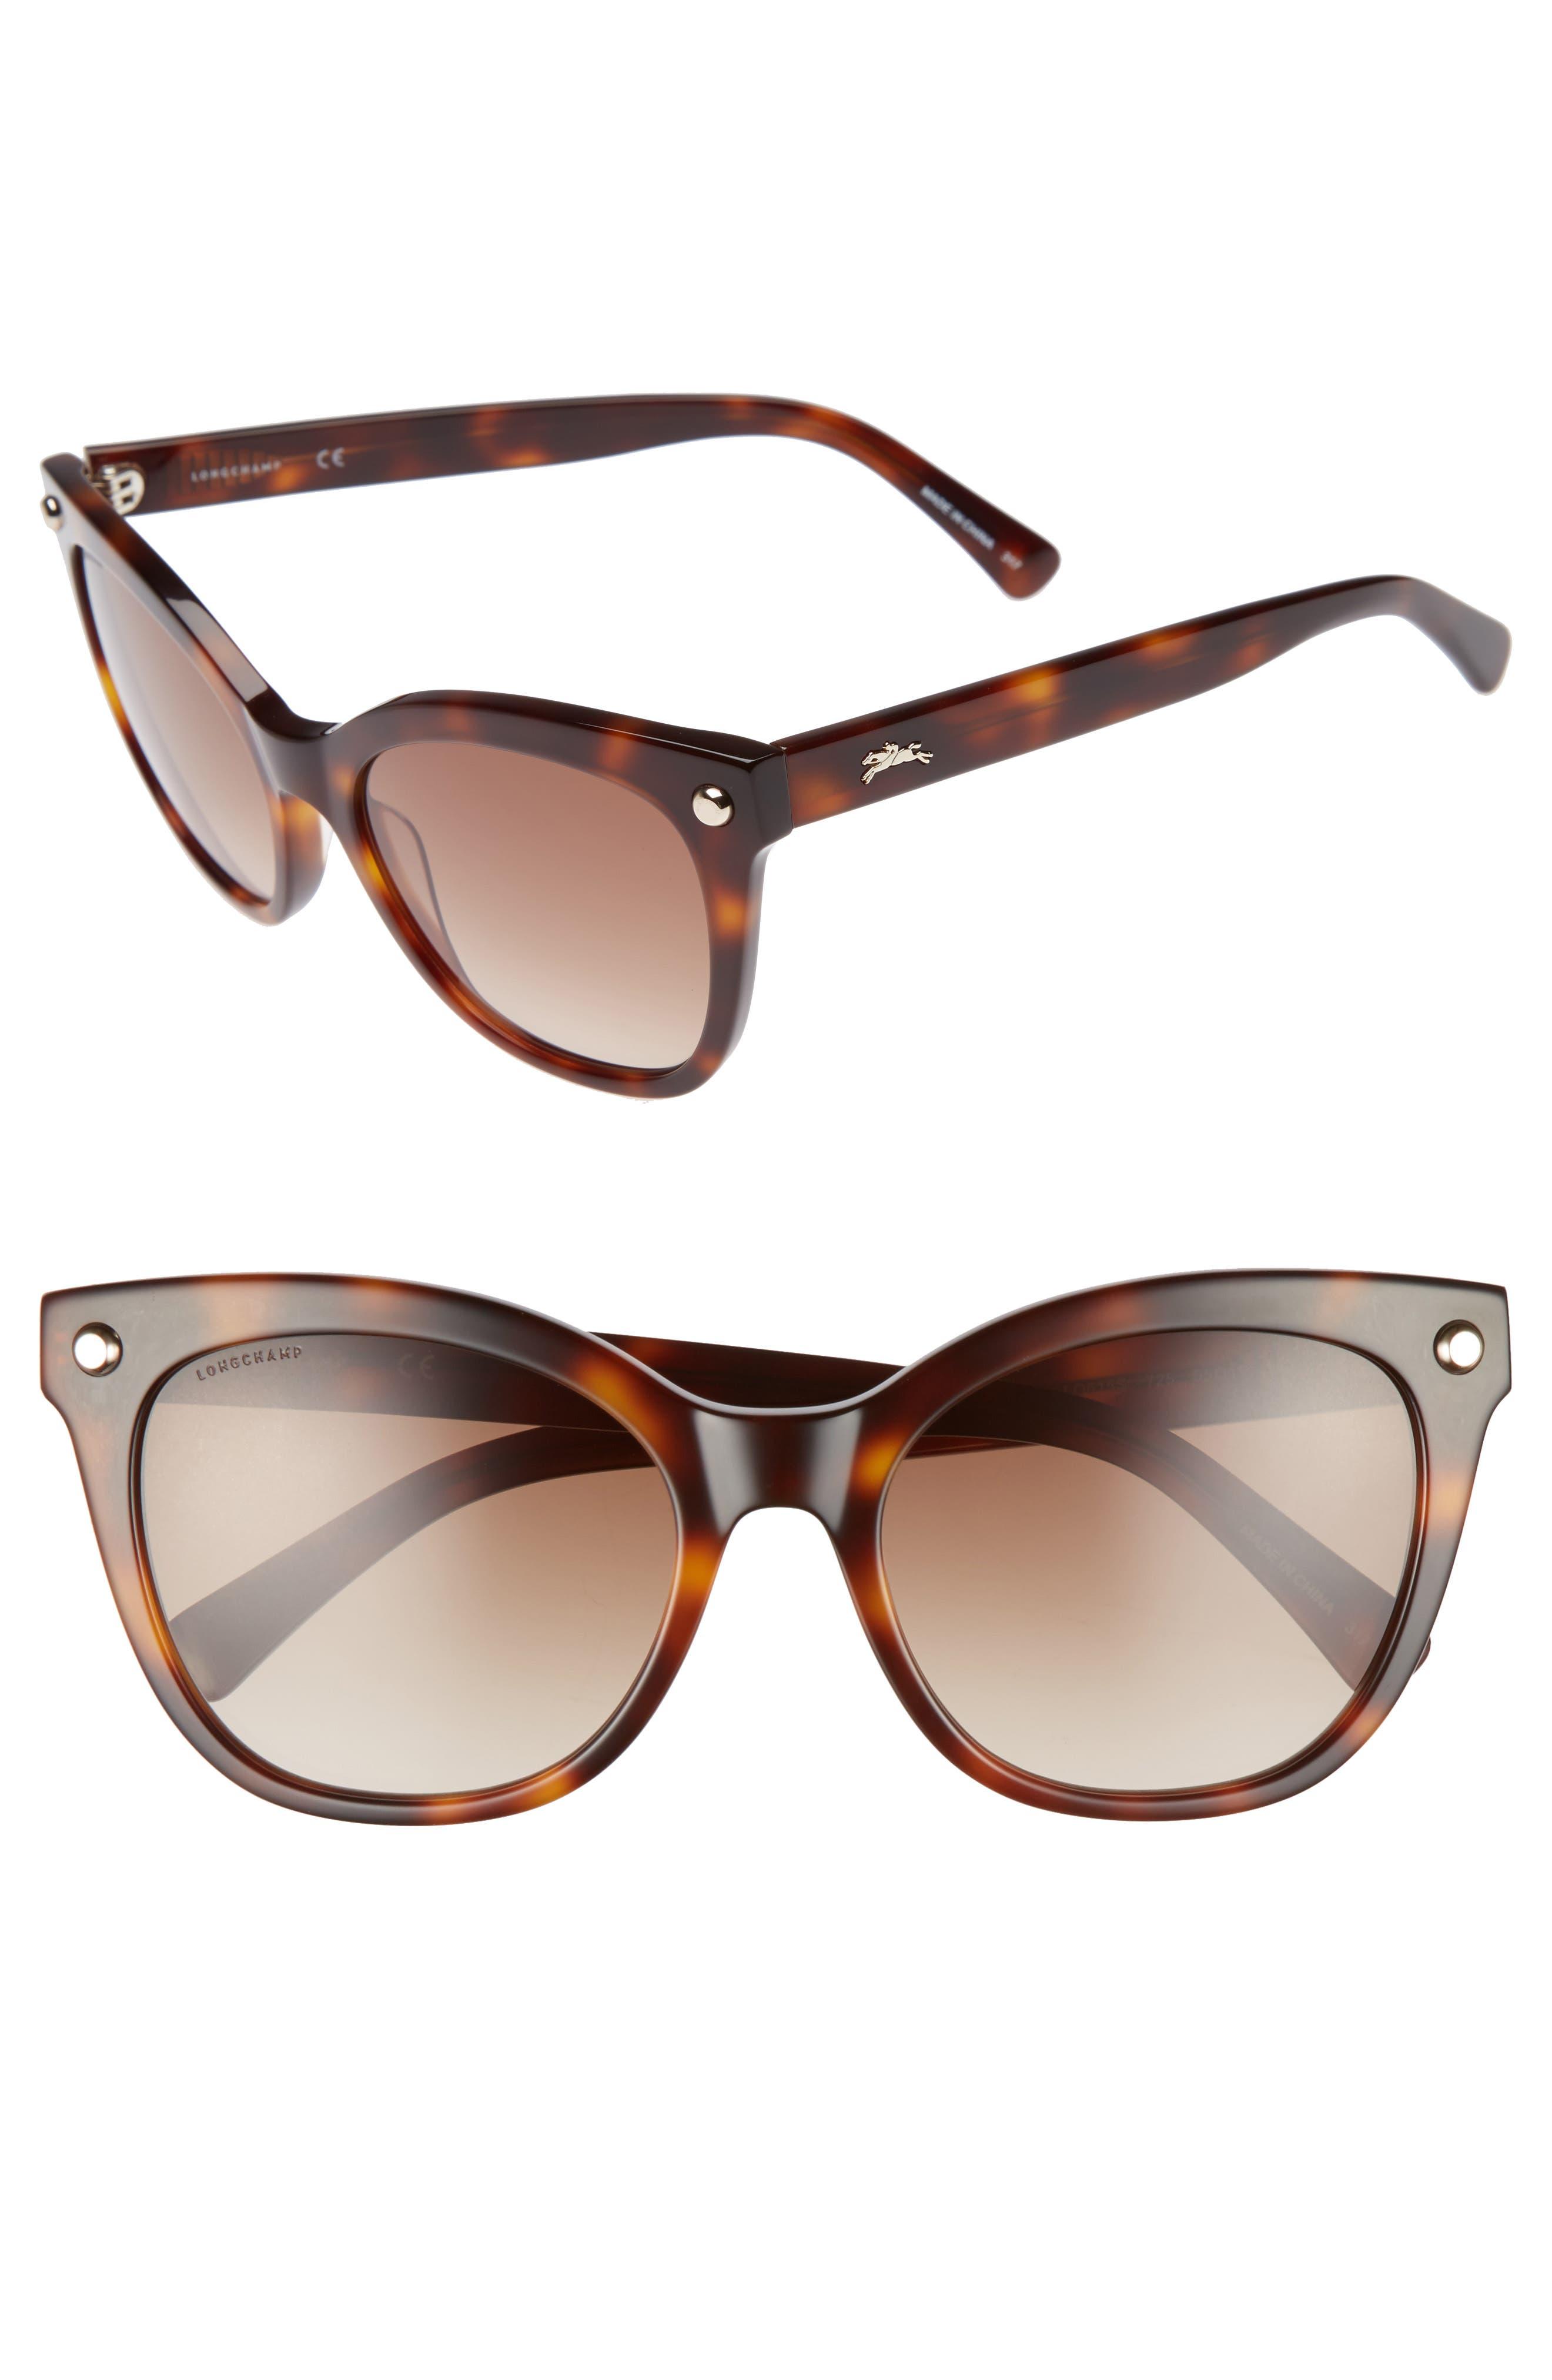 55mm Cat Eye Sunglasses,                         Main,                         color, Blonde Havana